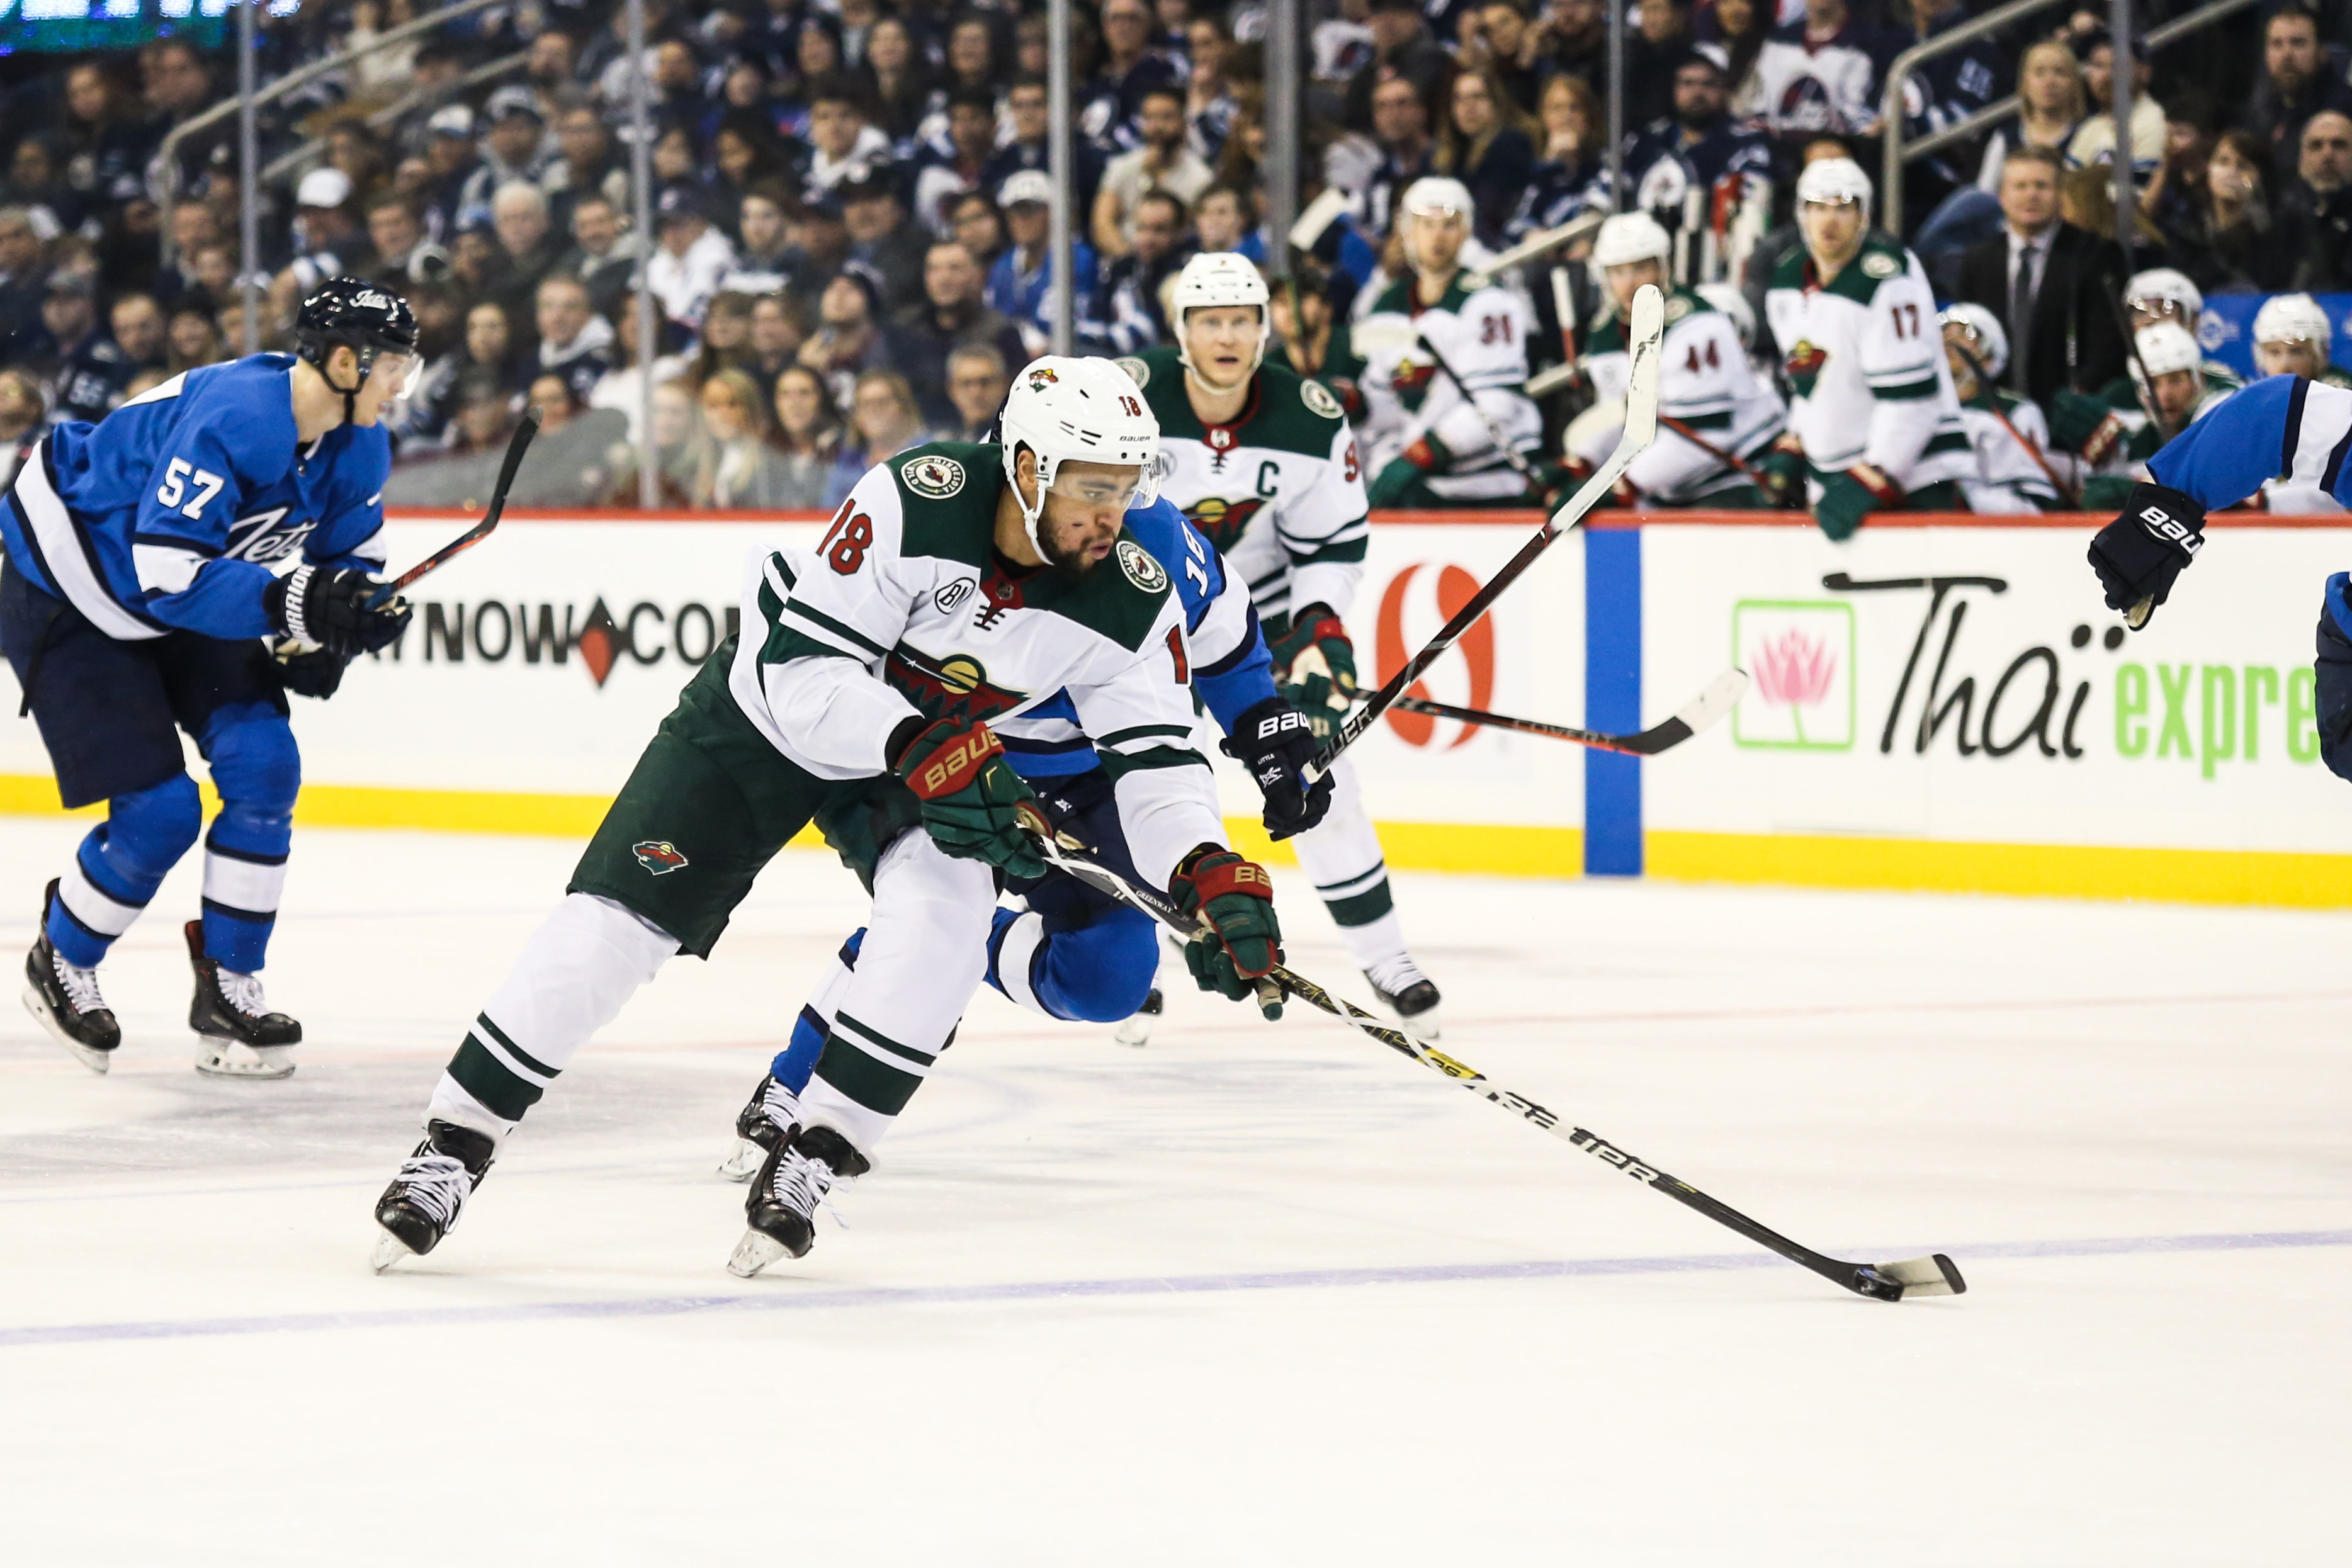 Persistent effort leads Wild to 3-2 regulation win over Jets